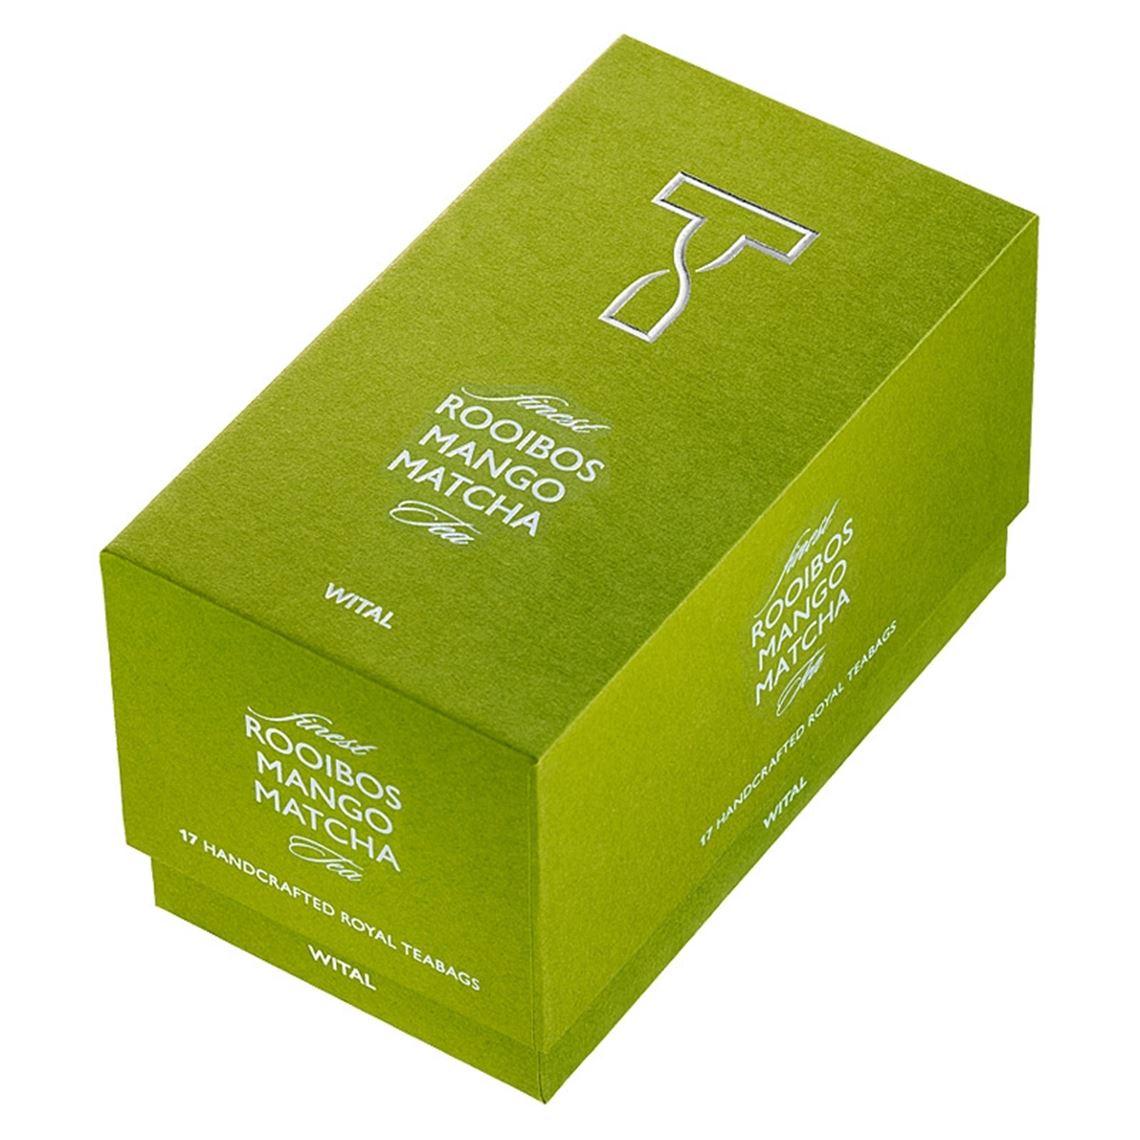 Wital Finest Tea Rooibos Mango Matcha 17x2,5g